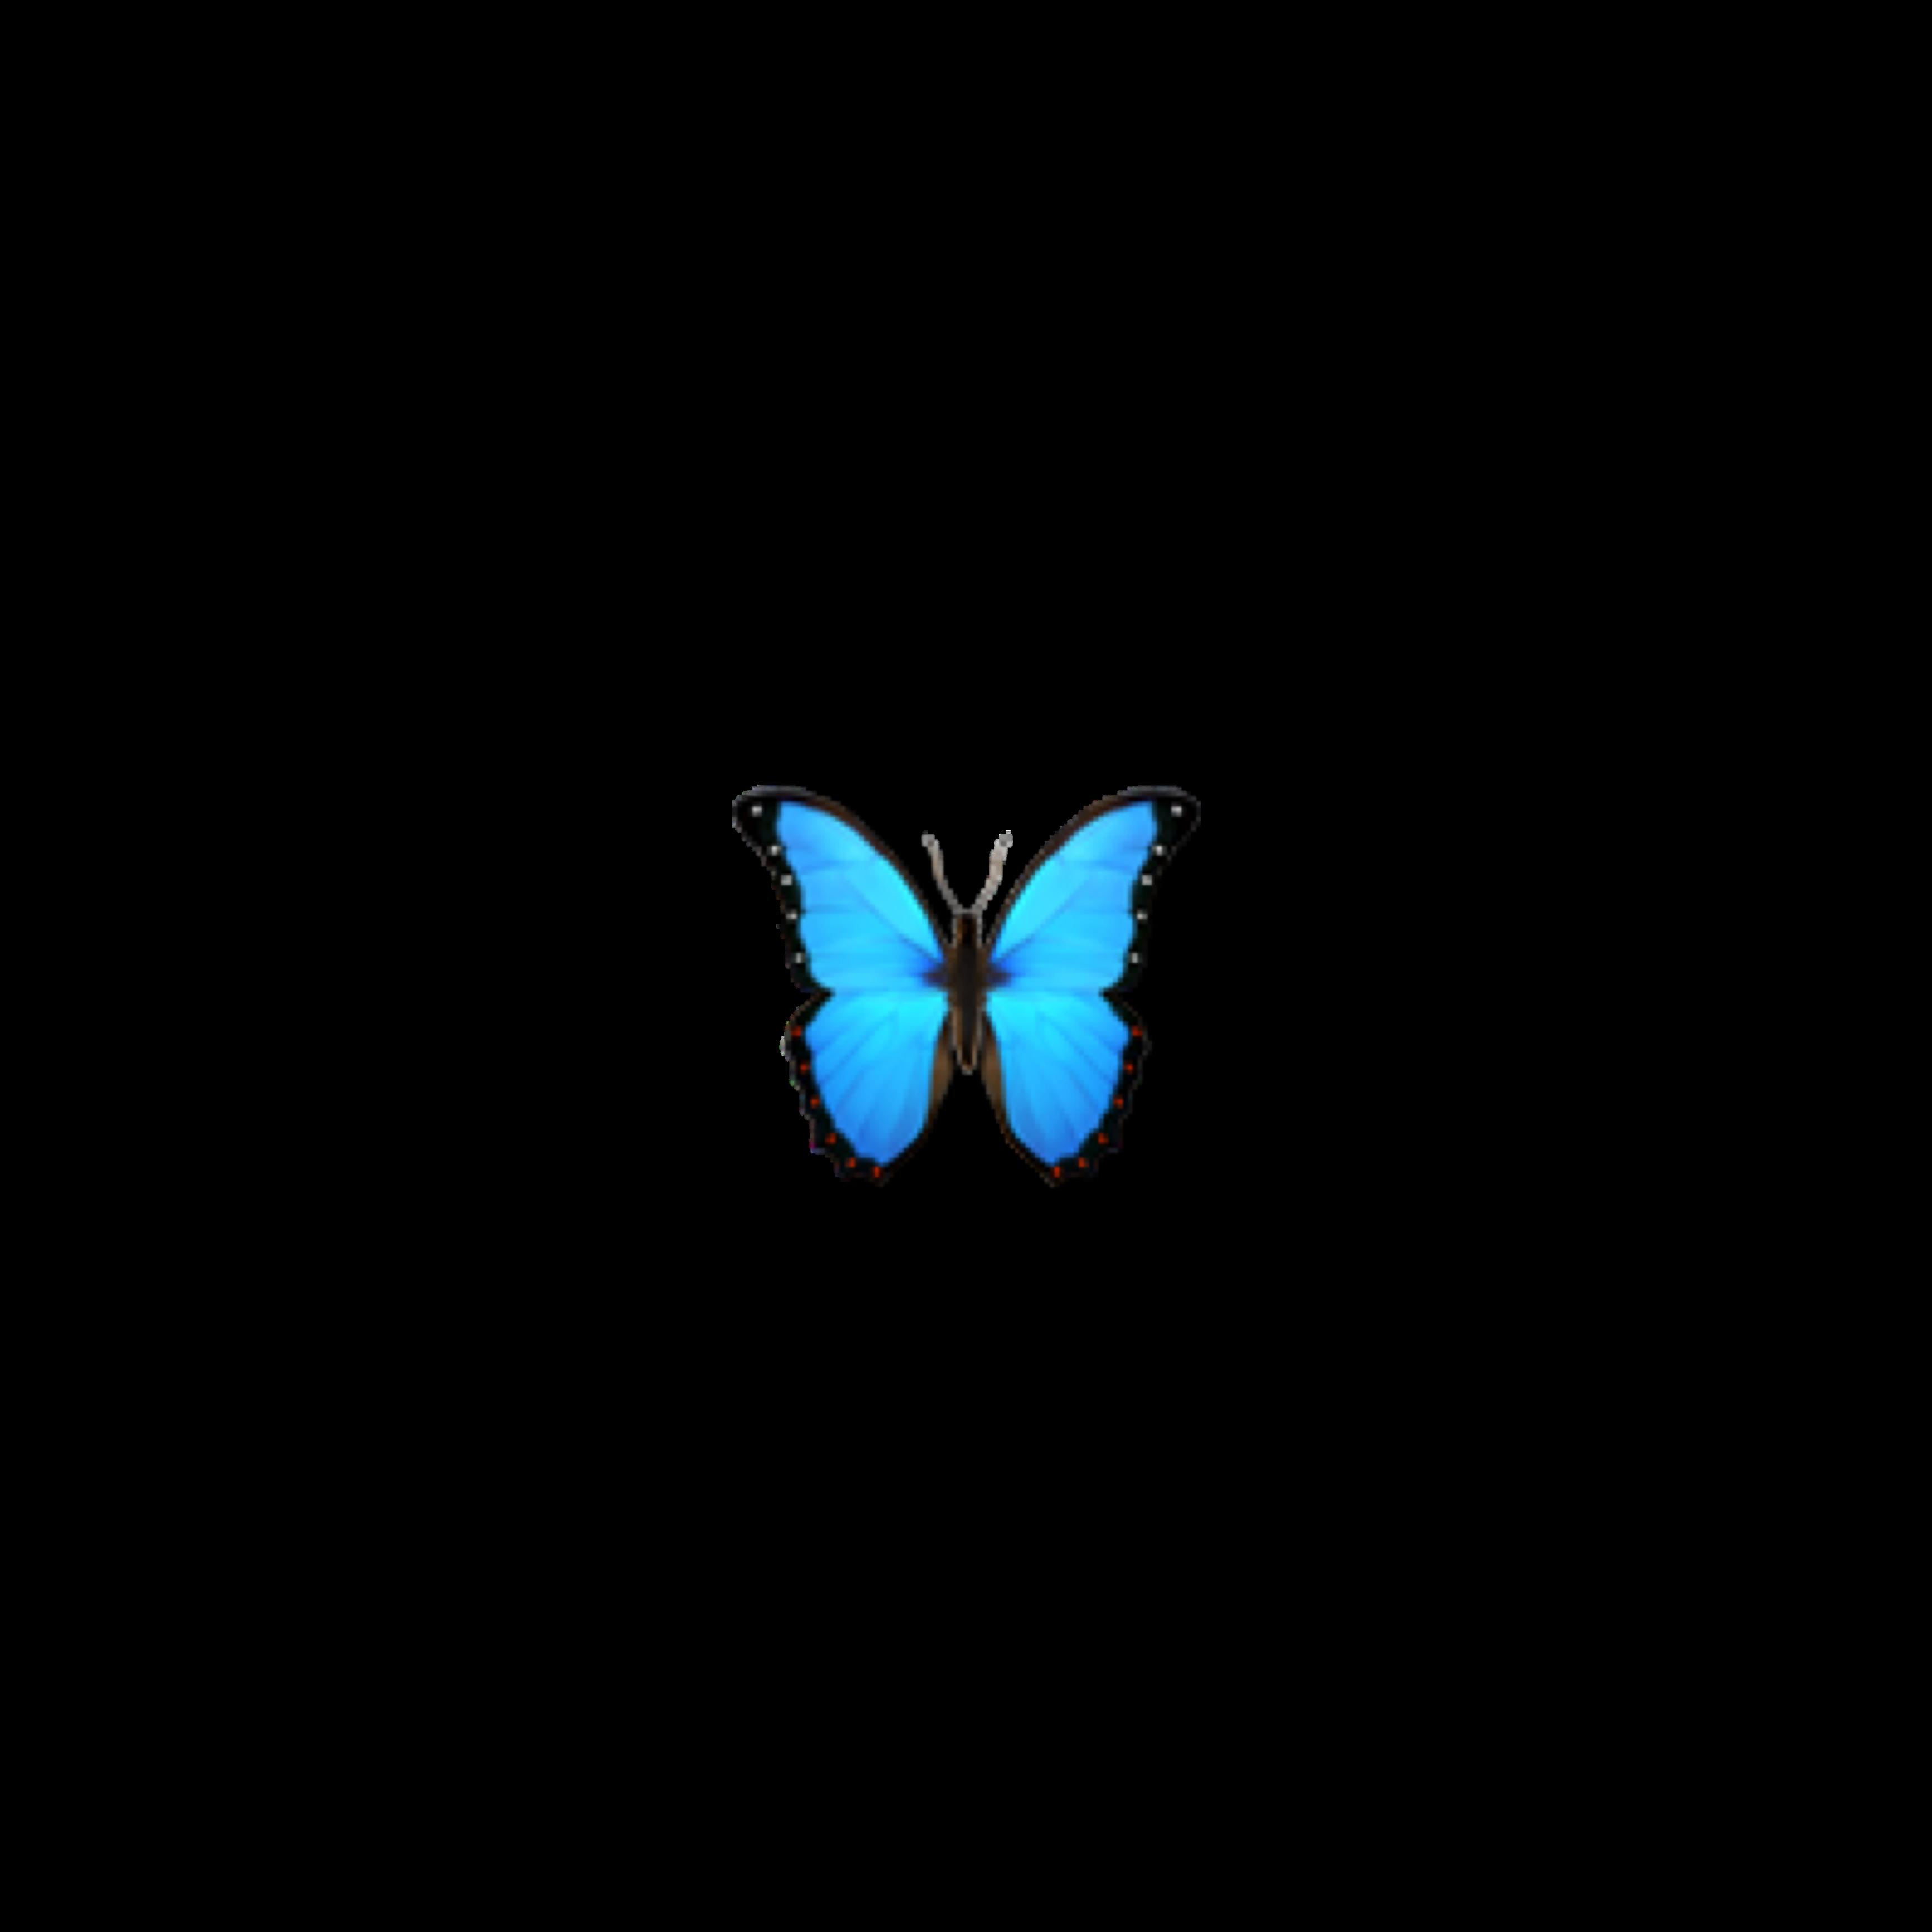 butterfly blue emoji appleemoji complexedit givecredit...